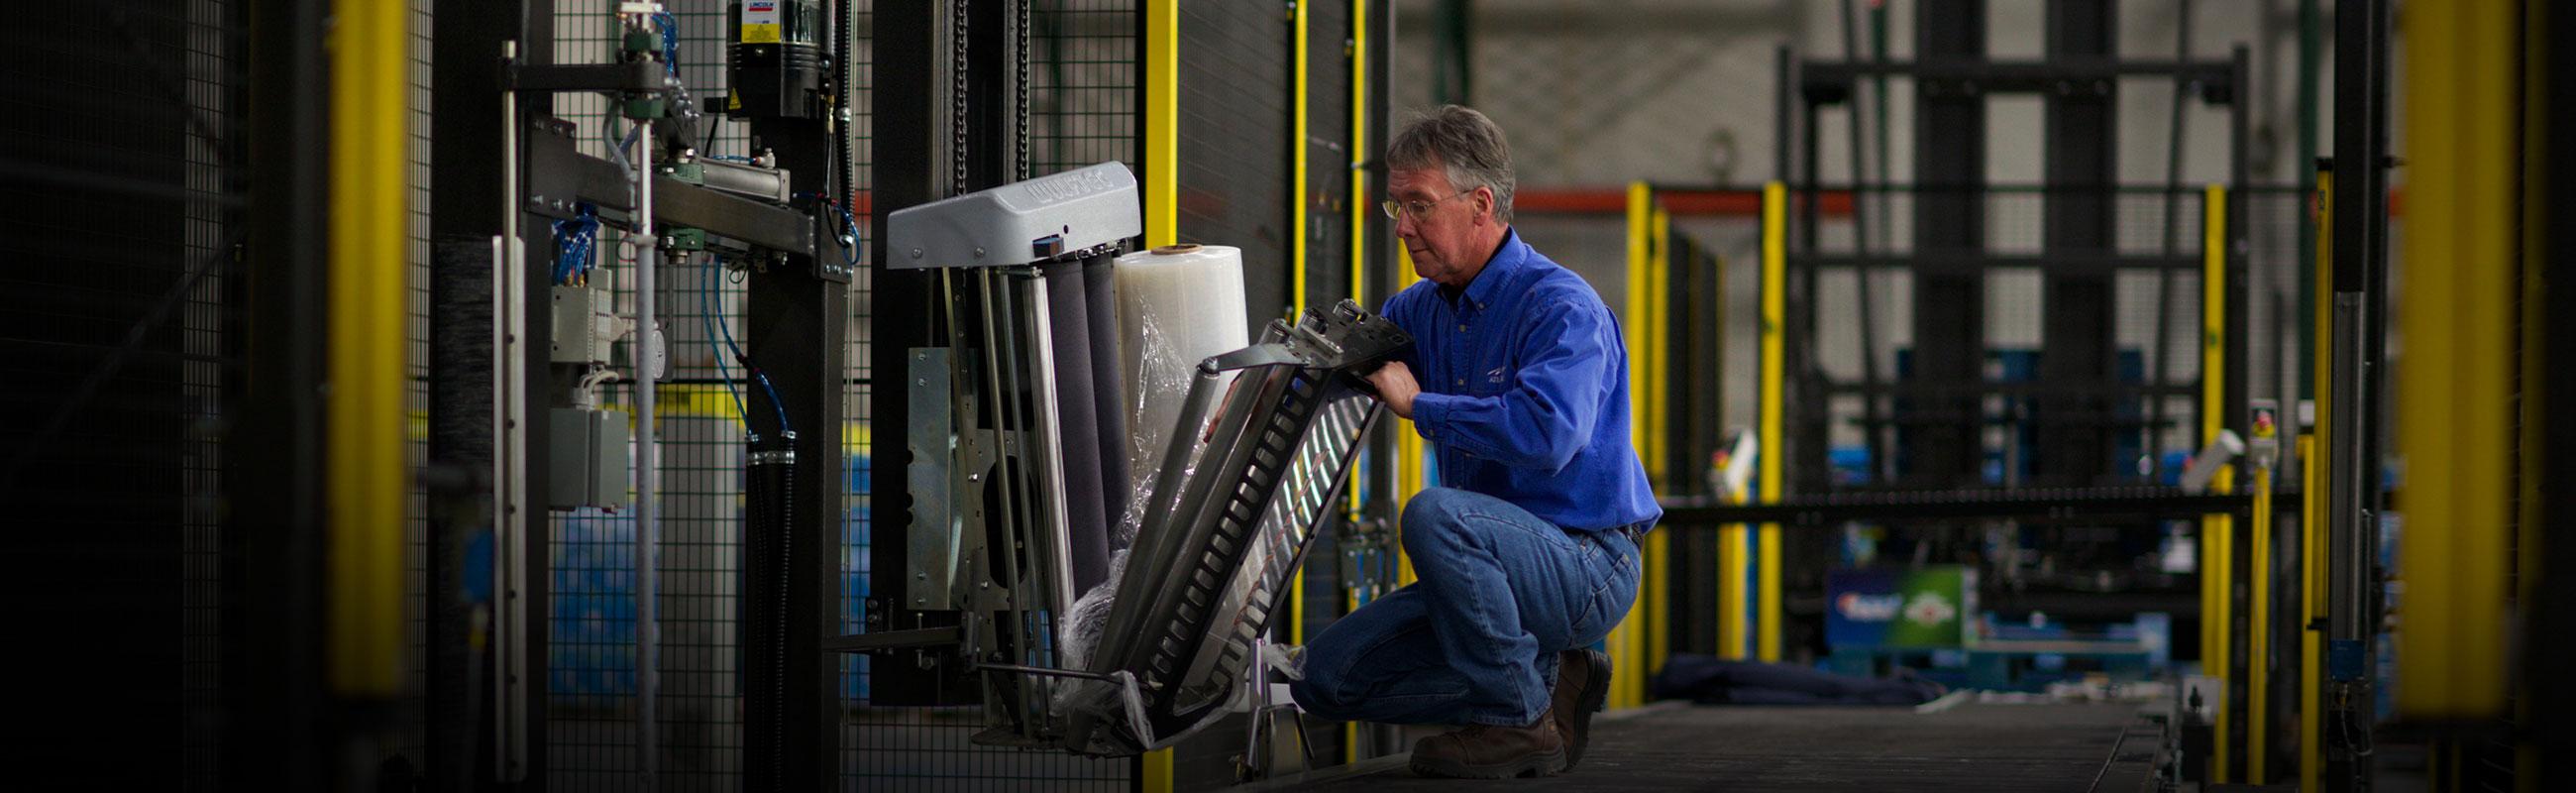 Ken fields automatic stretch wrapper tech service atlantic